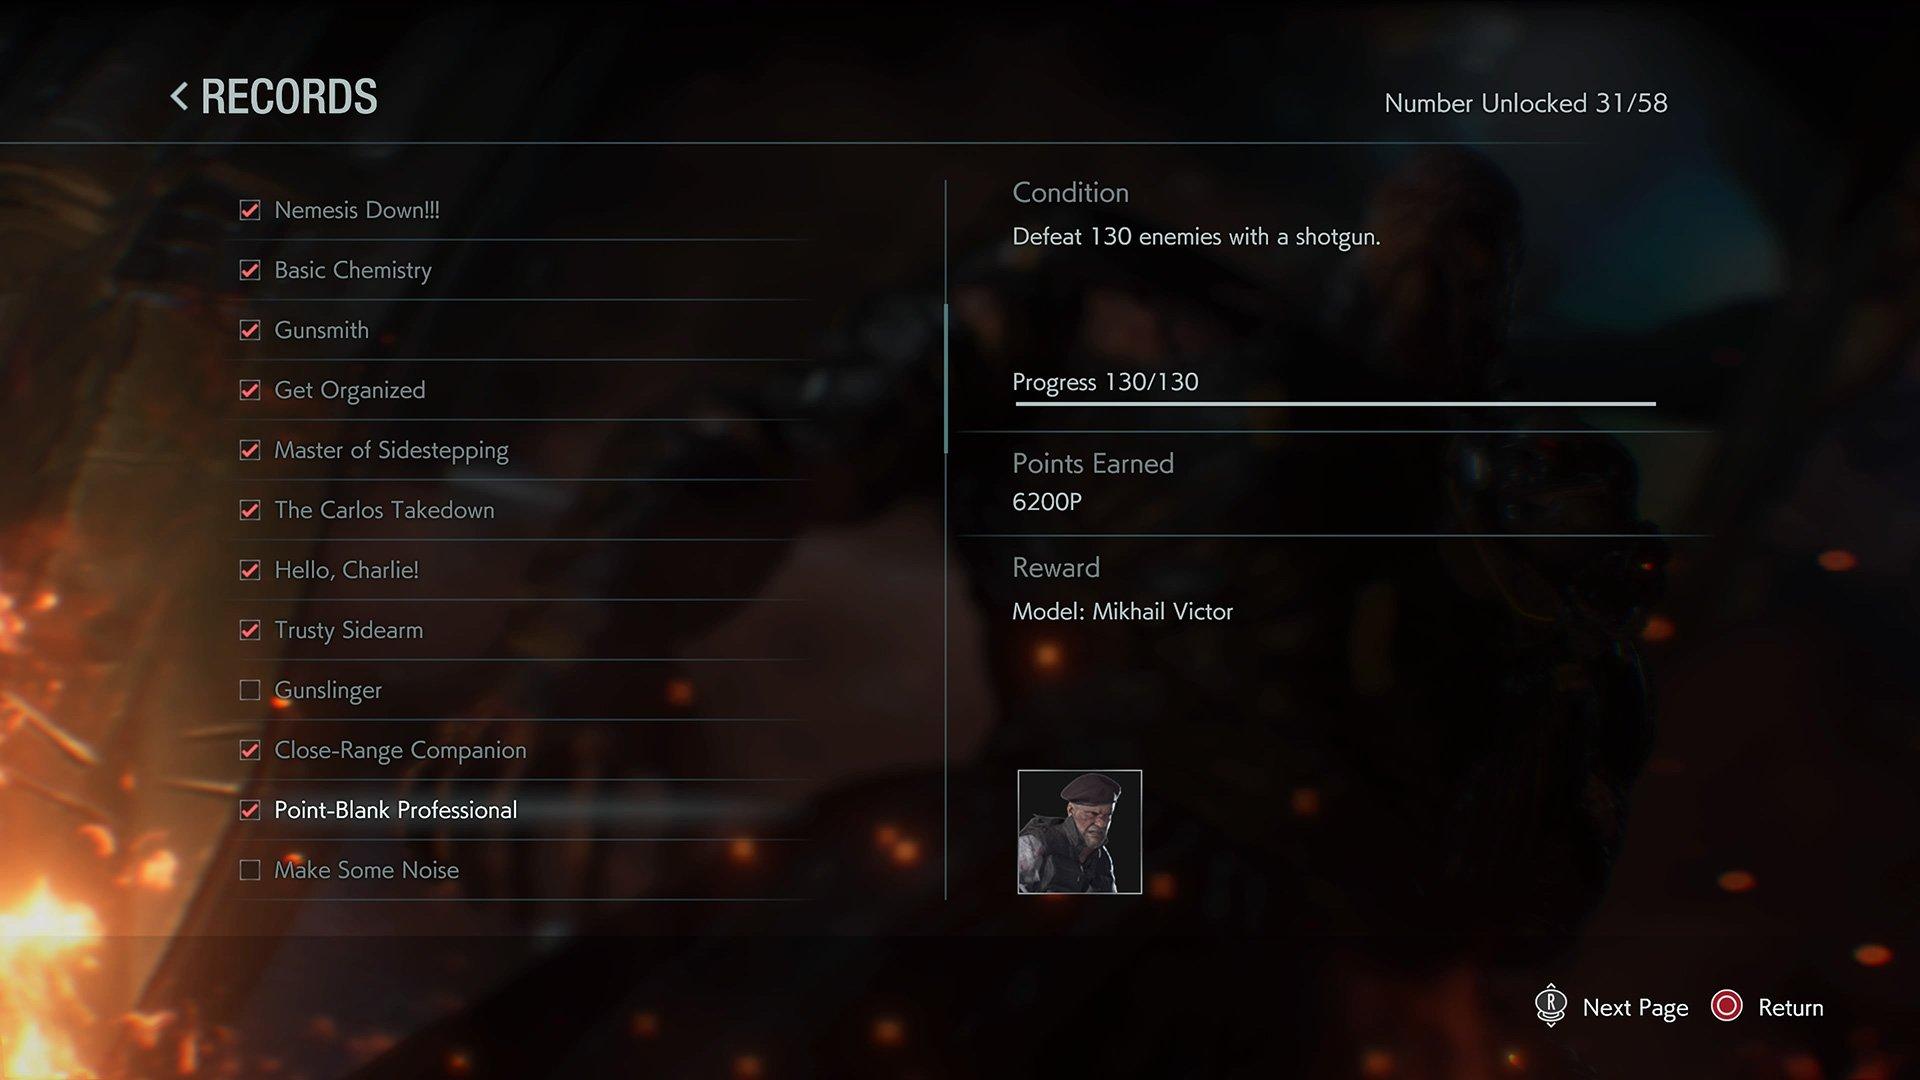 Resident Evil 3 record list